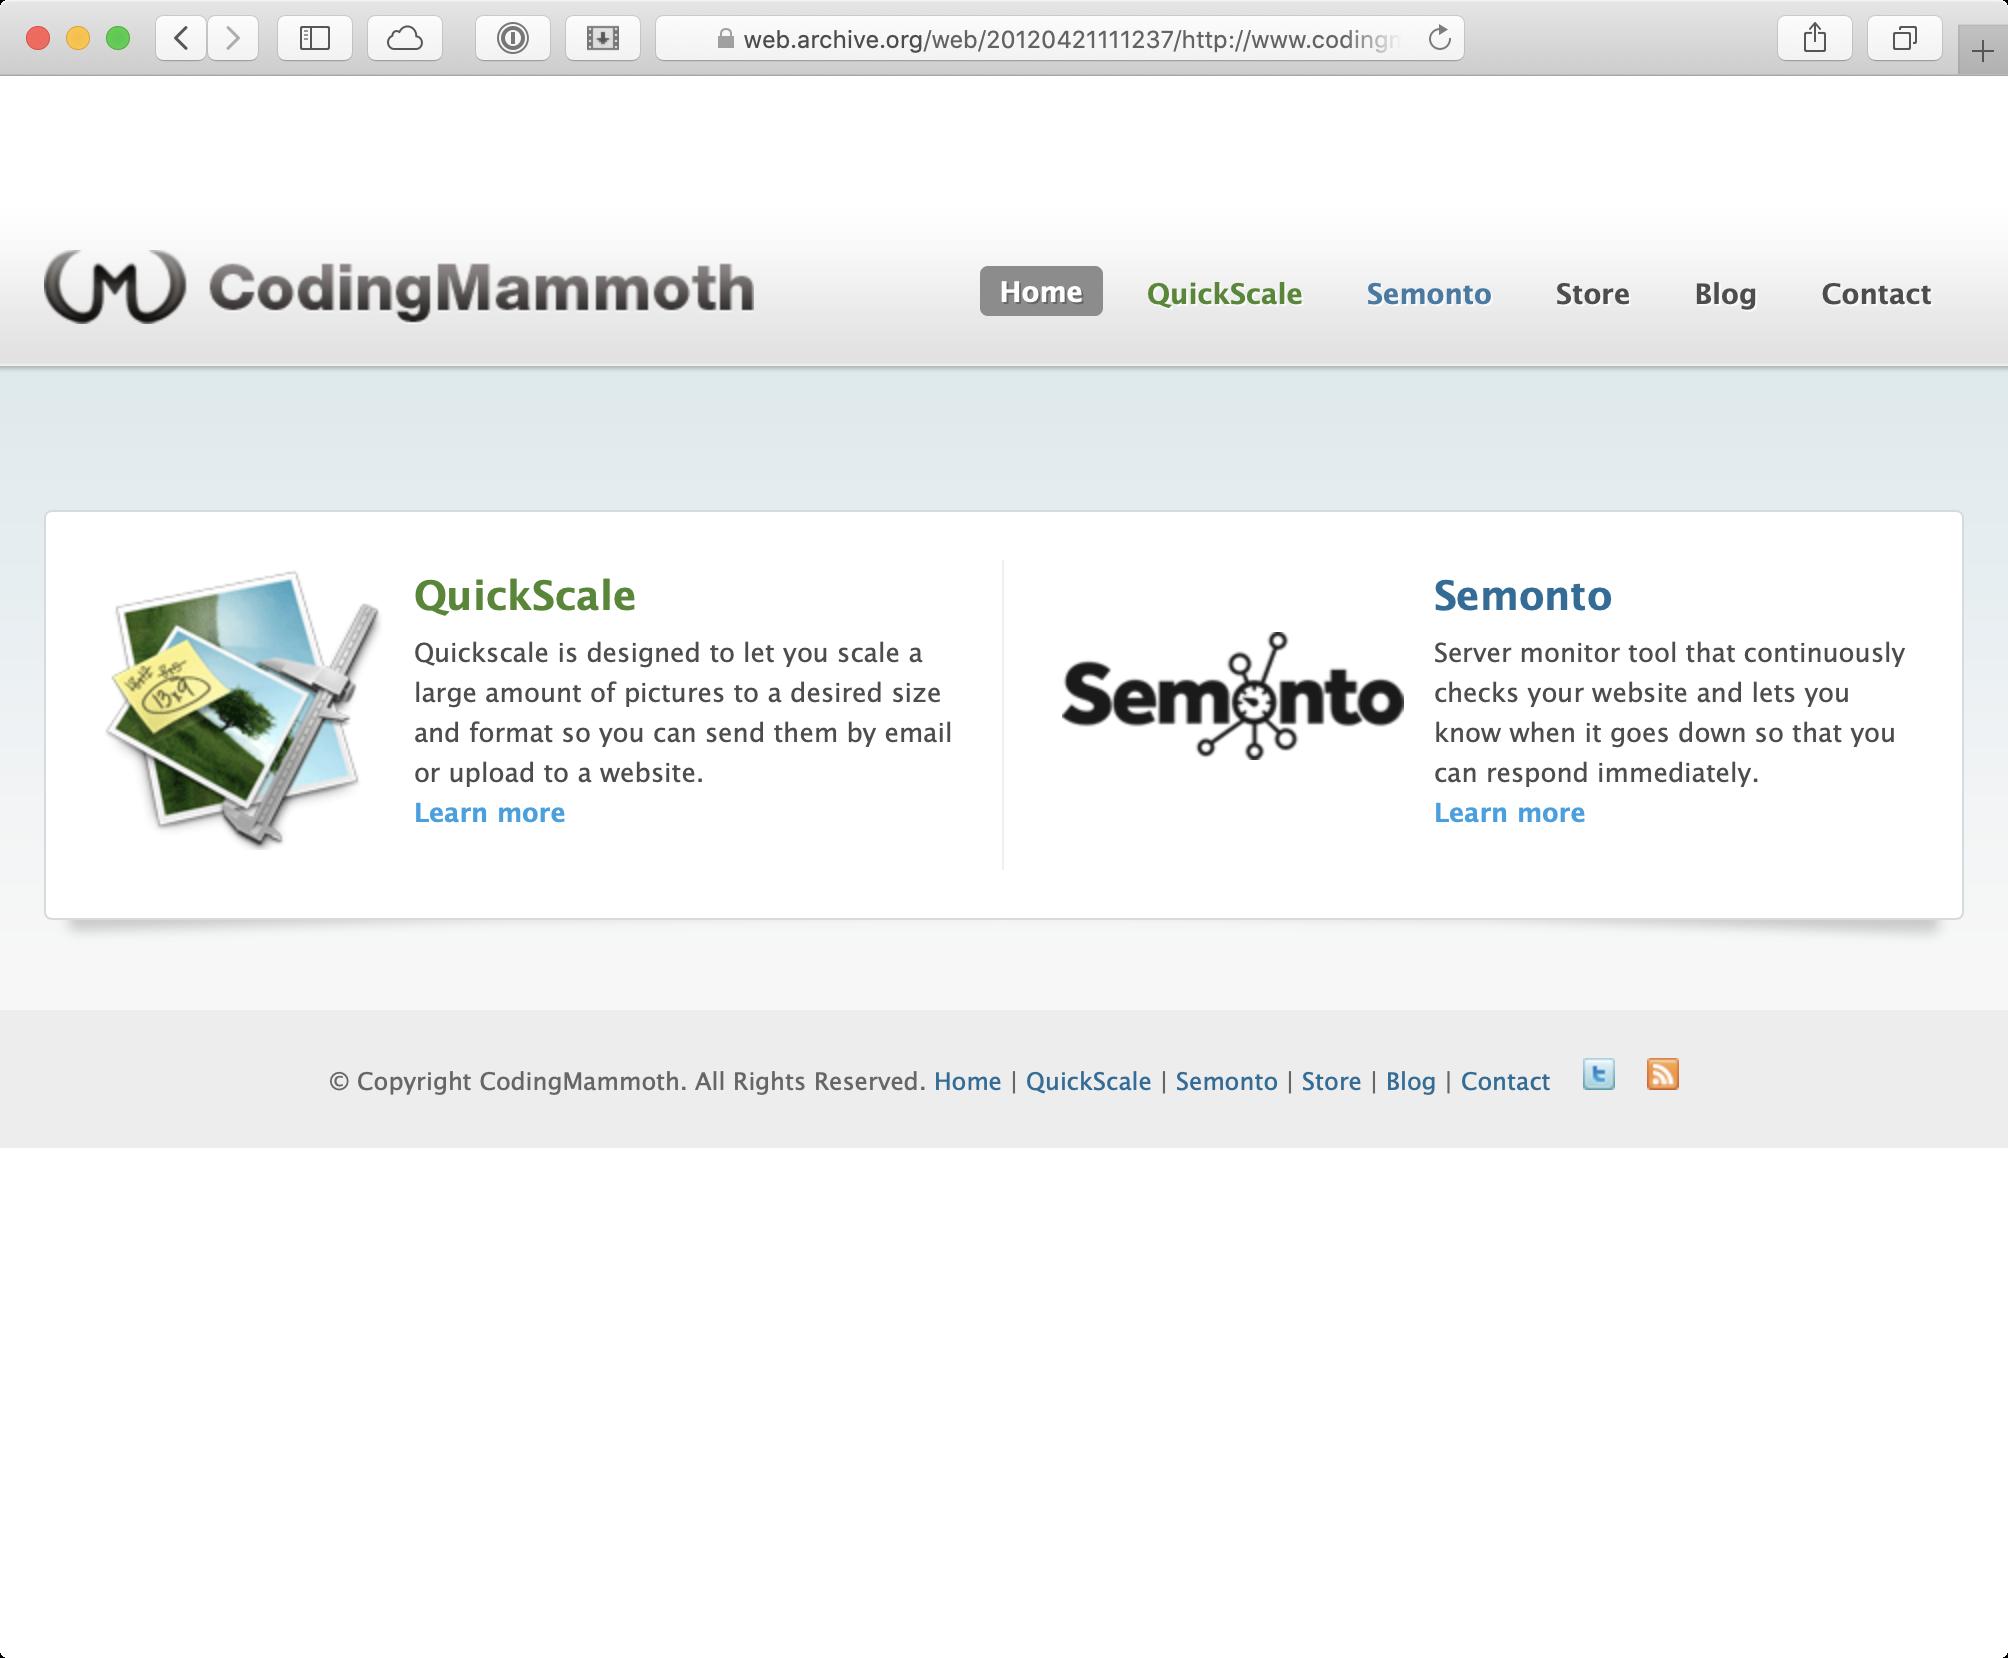 Website Coding Mammoth 2012